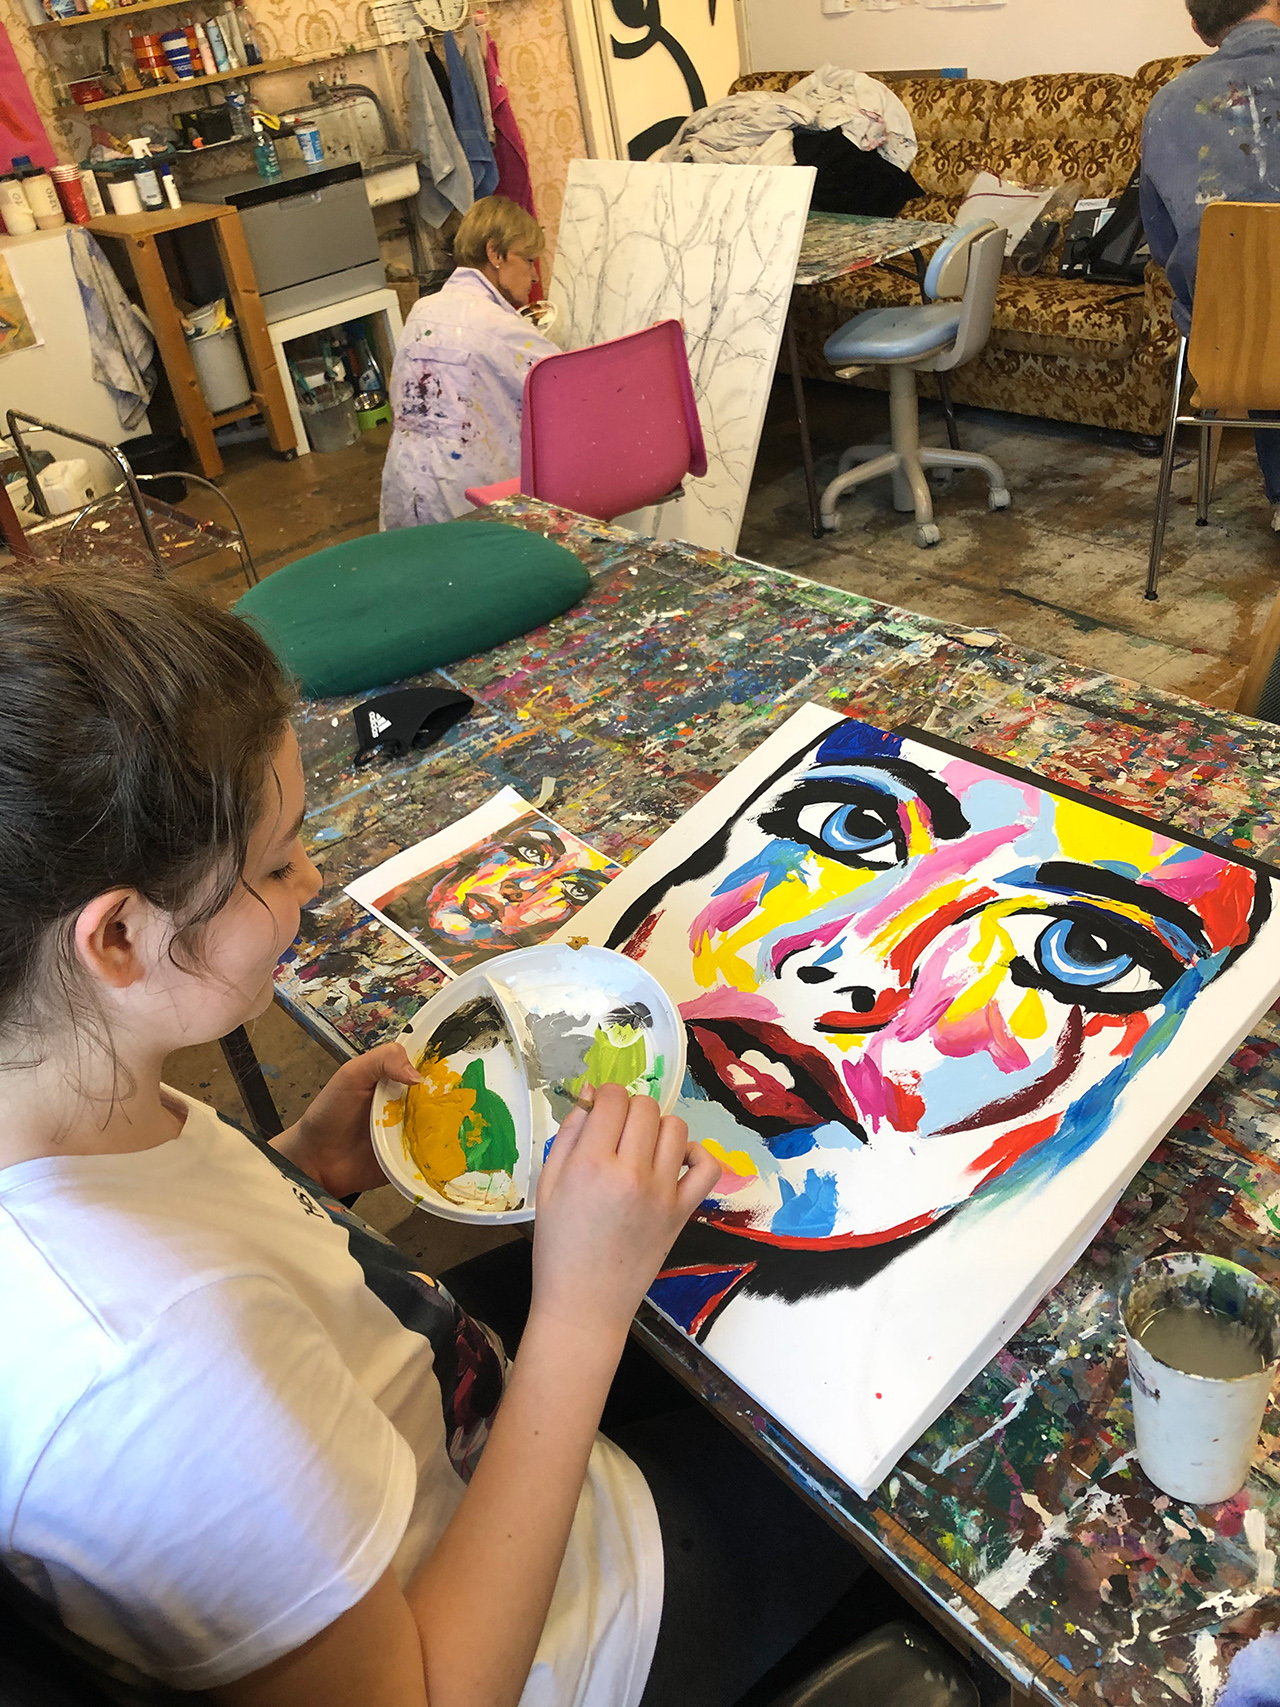 ccr-atelier_claudia-cremer_bodenmalerei-14